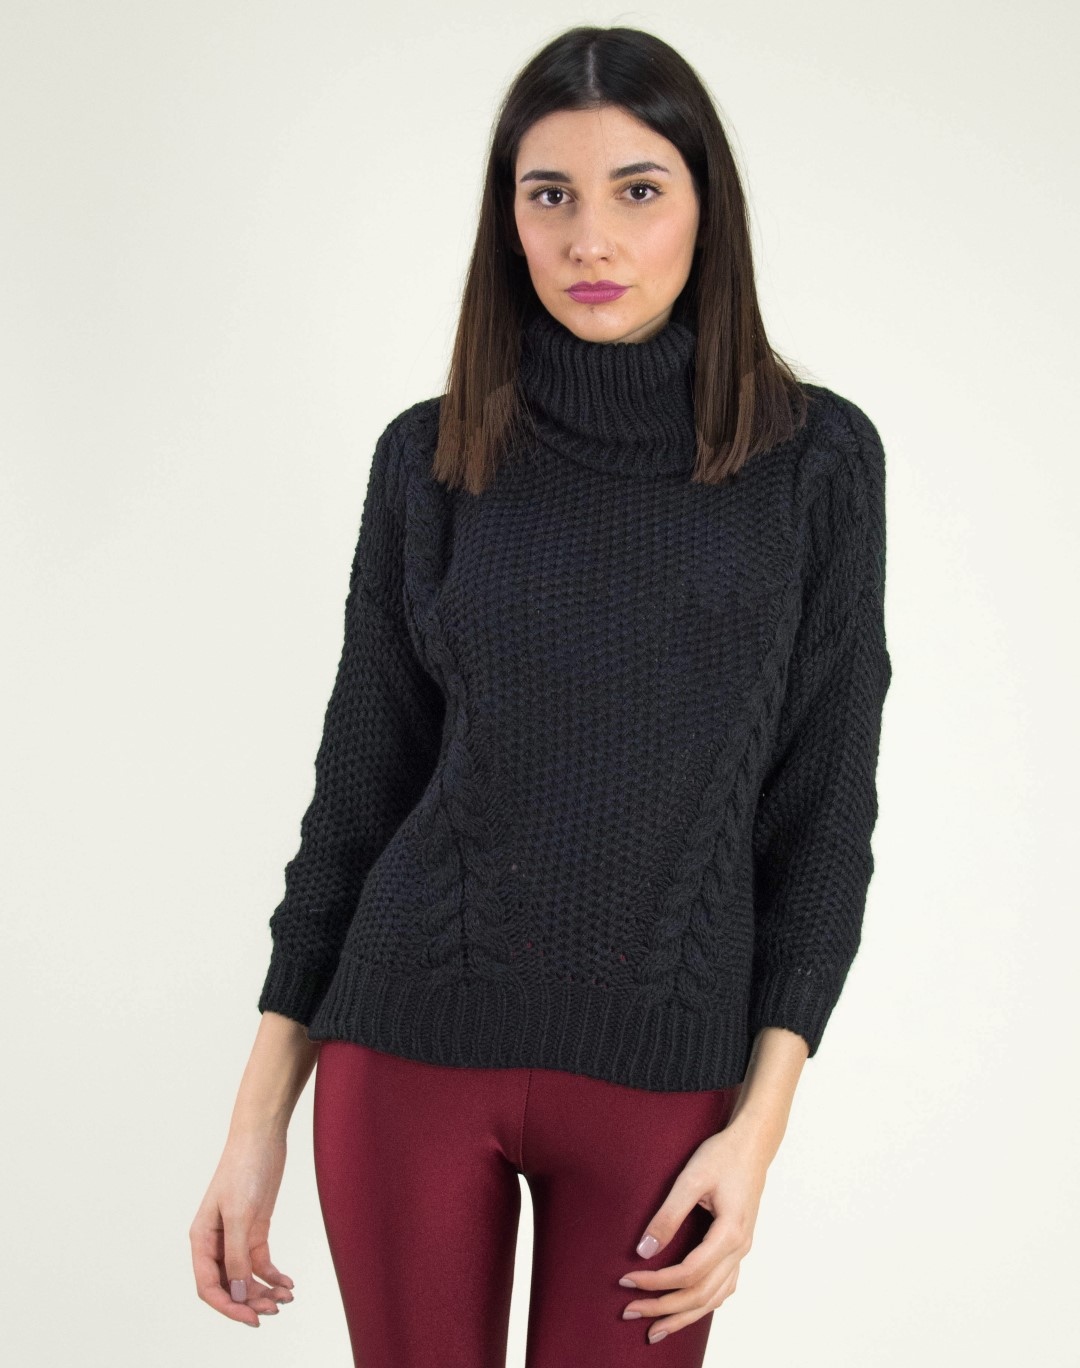 1b49ed9e60df Γυναικείο μαύρο πλεκτό πουλόβερ με ζιβάγκο 8682C